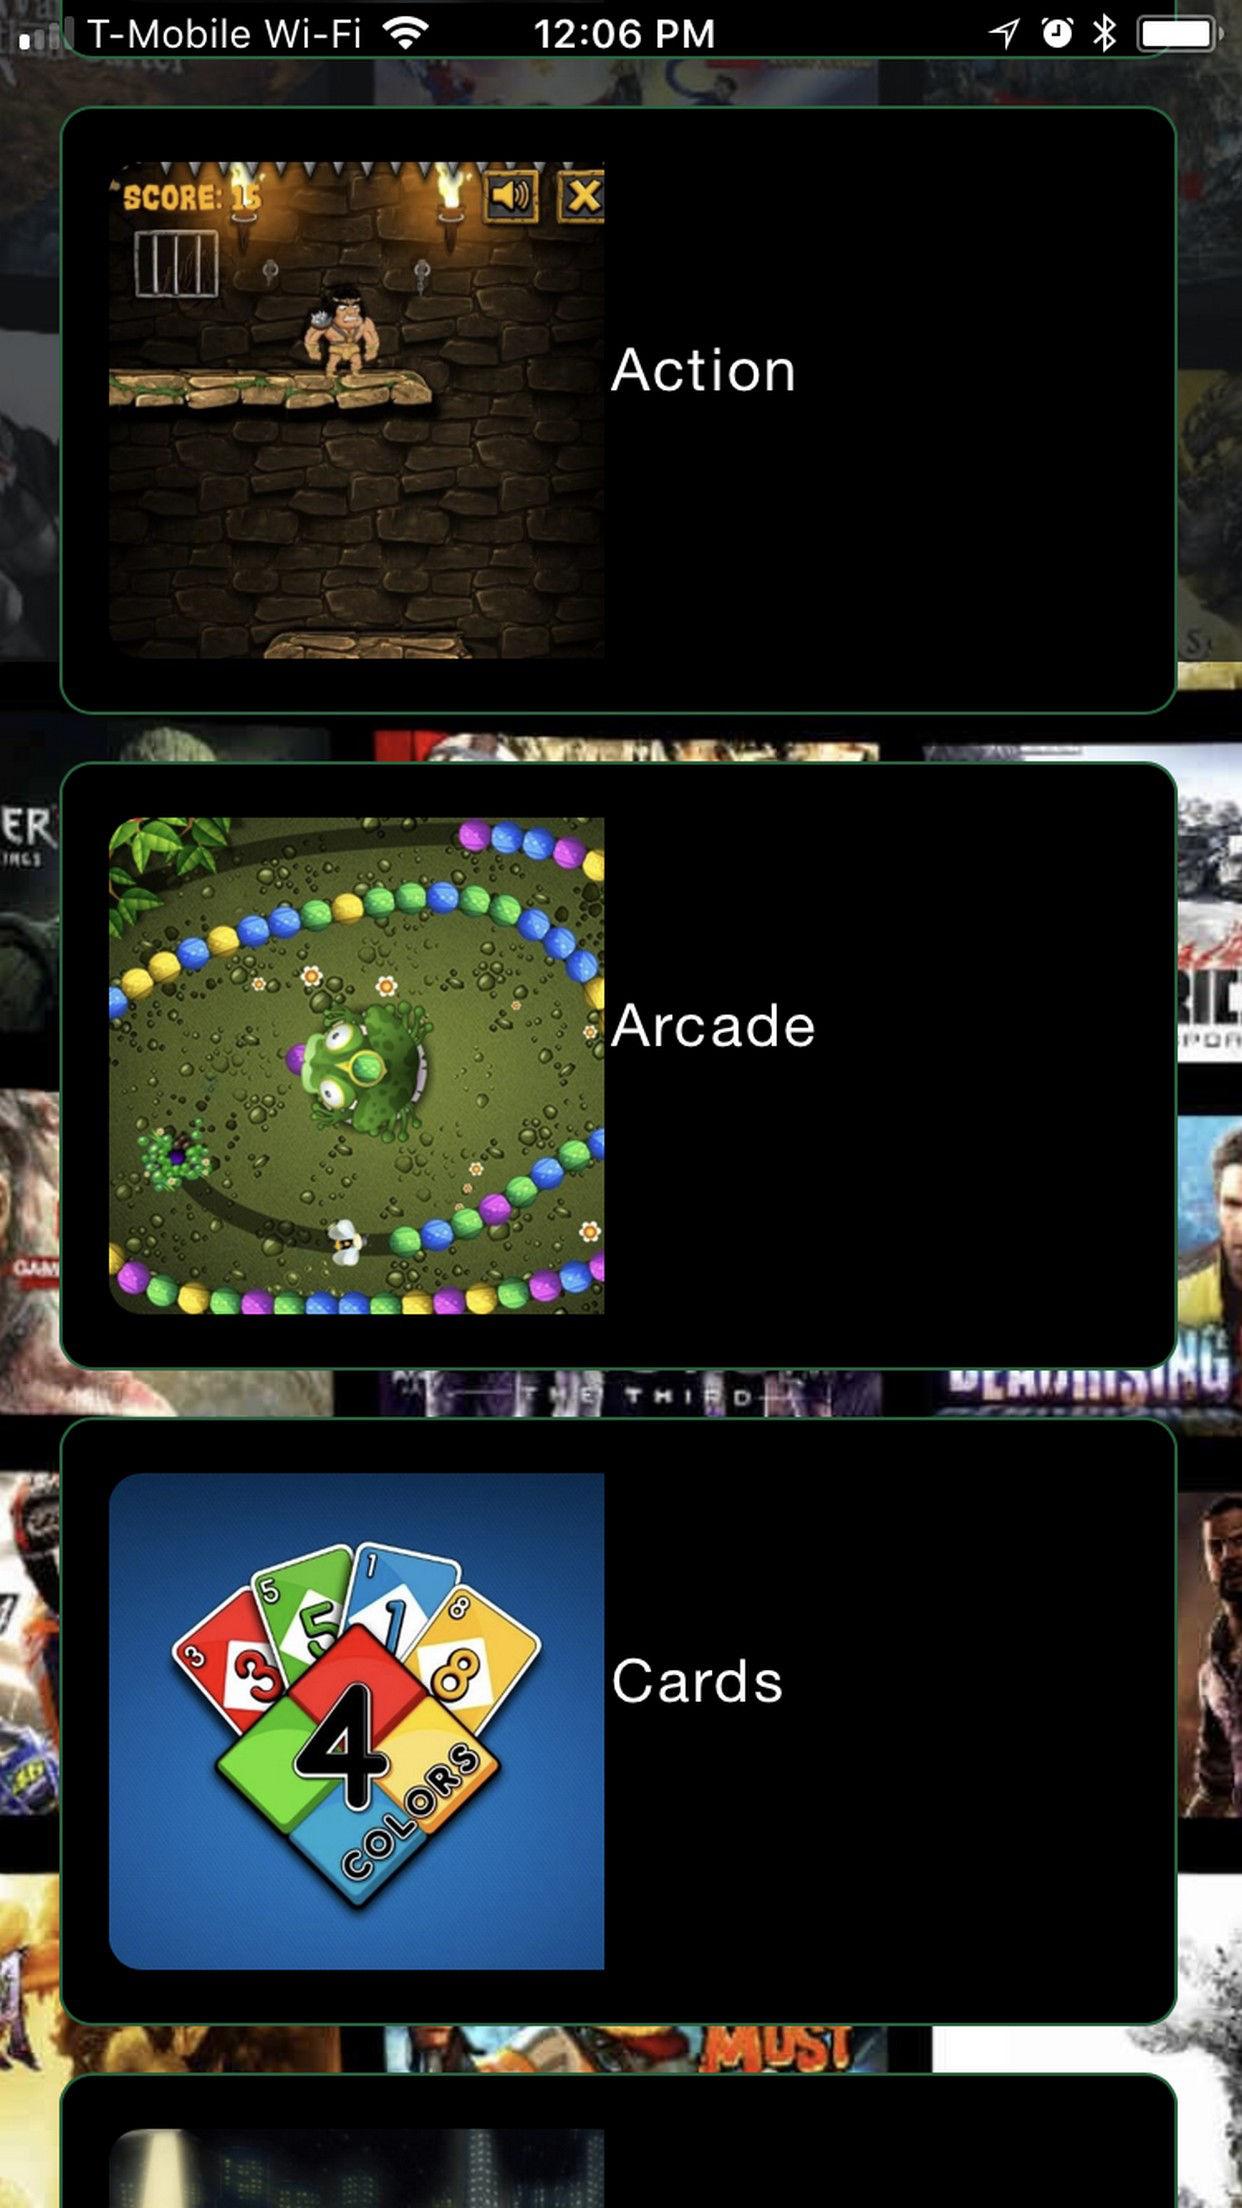 Arcade Portal